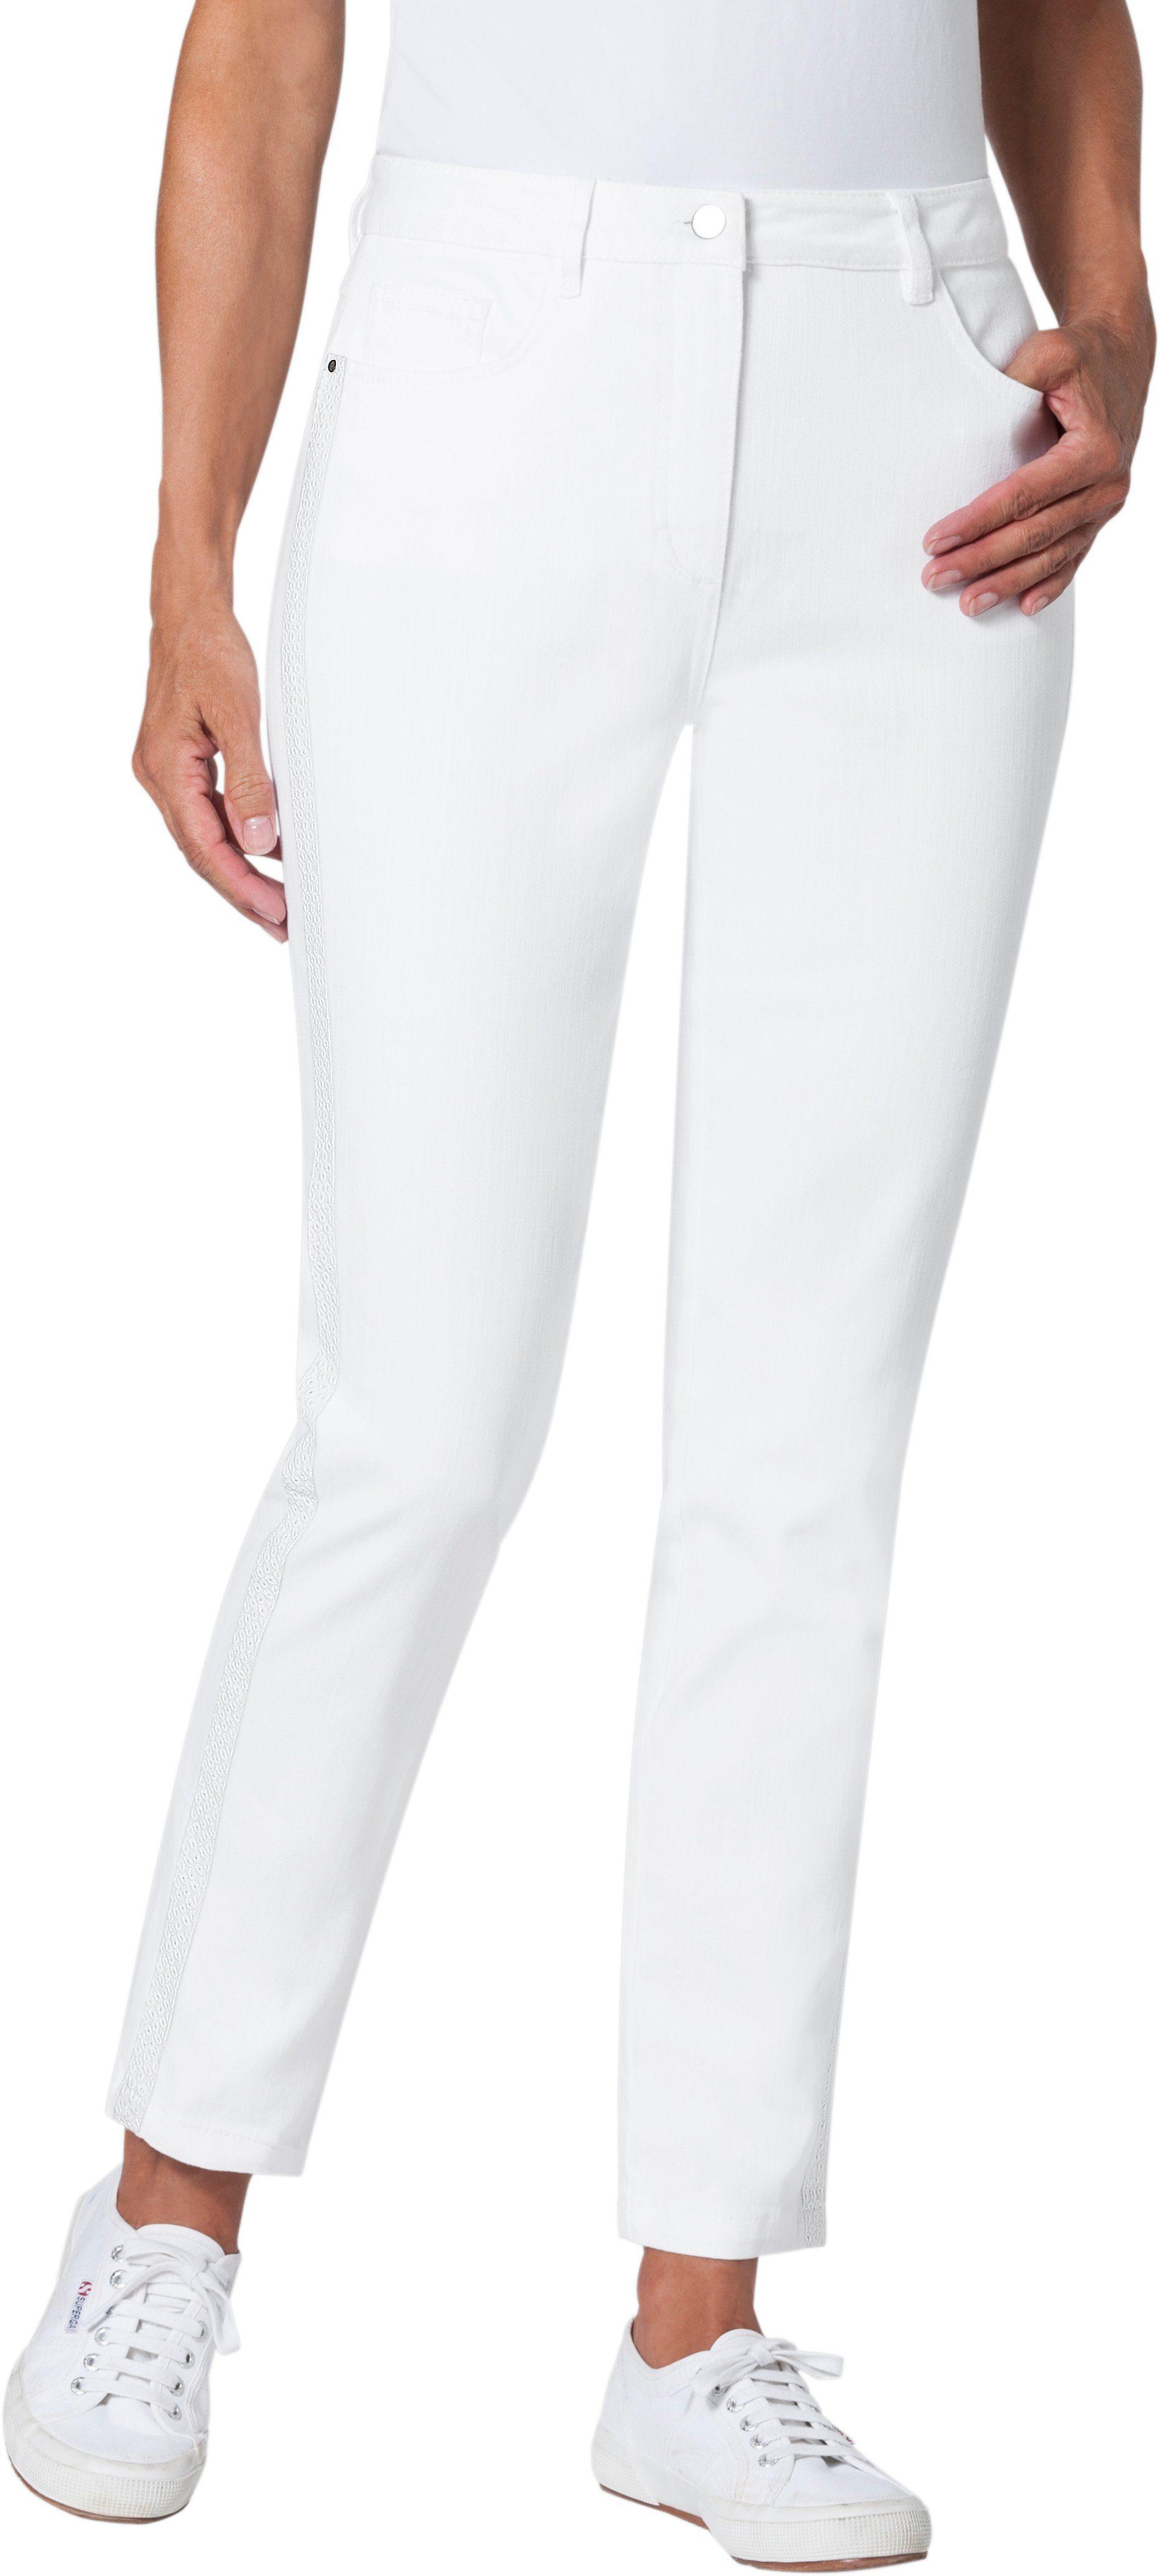 Ambria Jeans in in knöchelfreier Länge